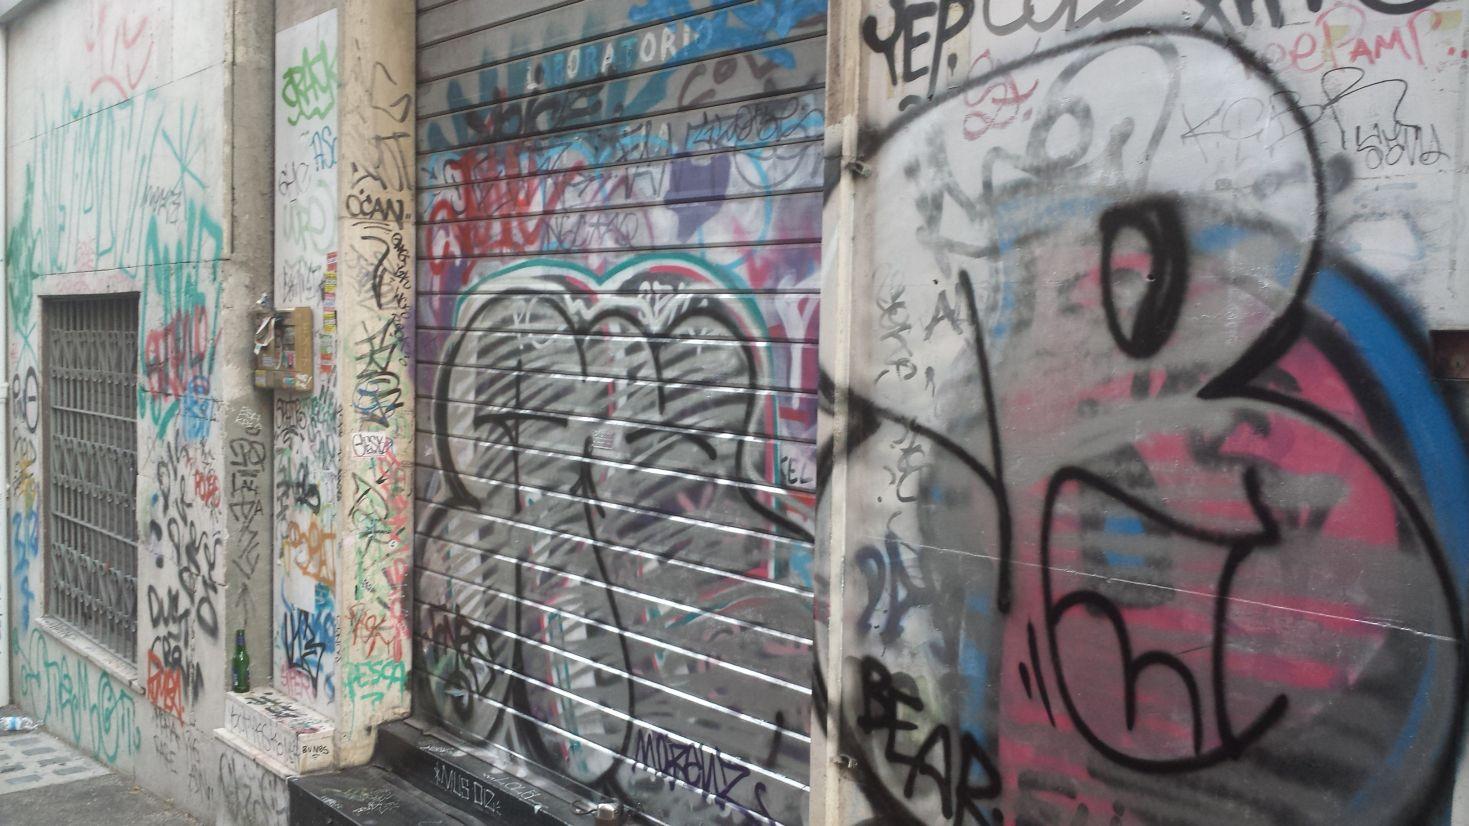 Via Gela graffiti 2